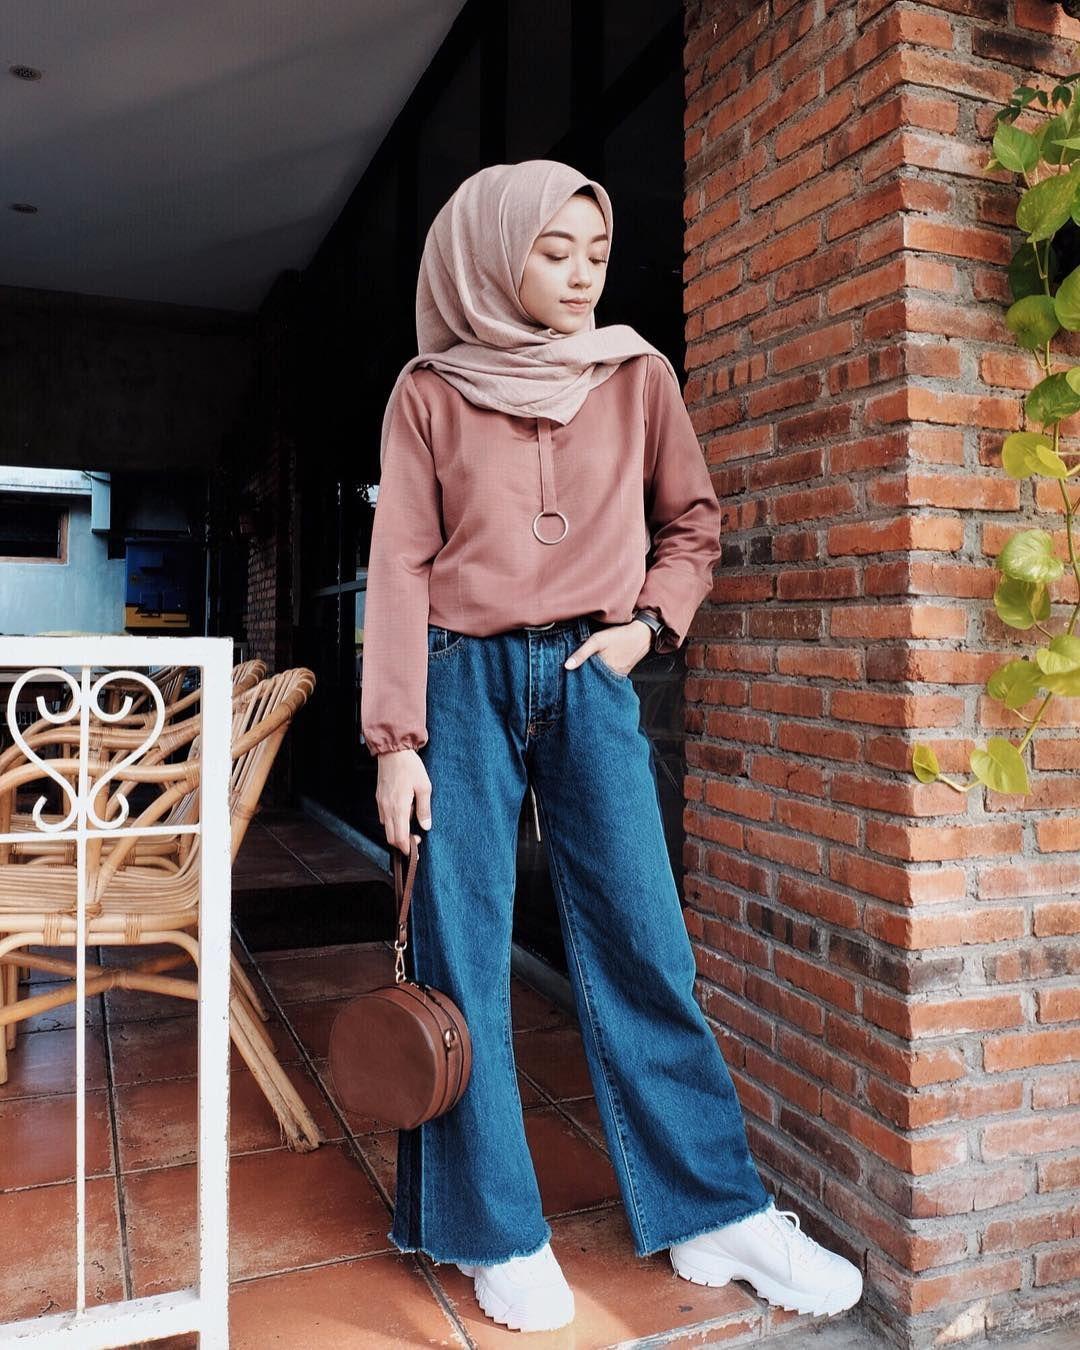 Sakina Gulamhusein On Pinterest Model Pakaian Model Pakaian Hijab Gaya Berpakaian